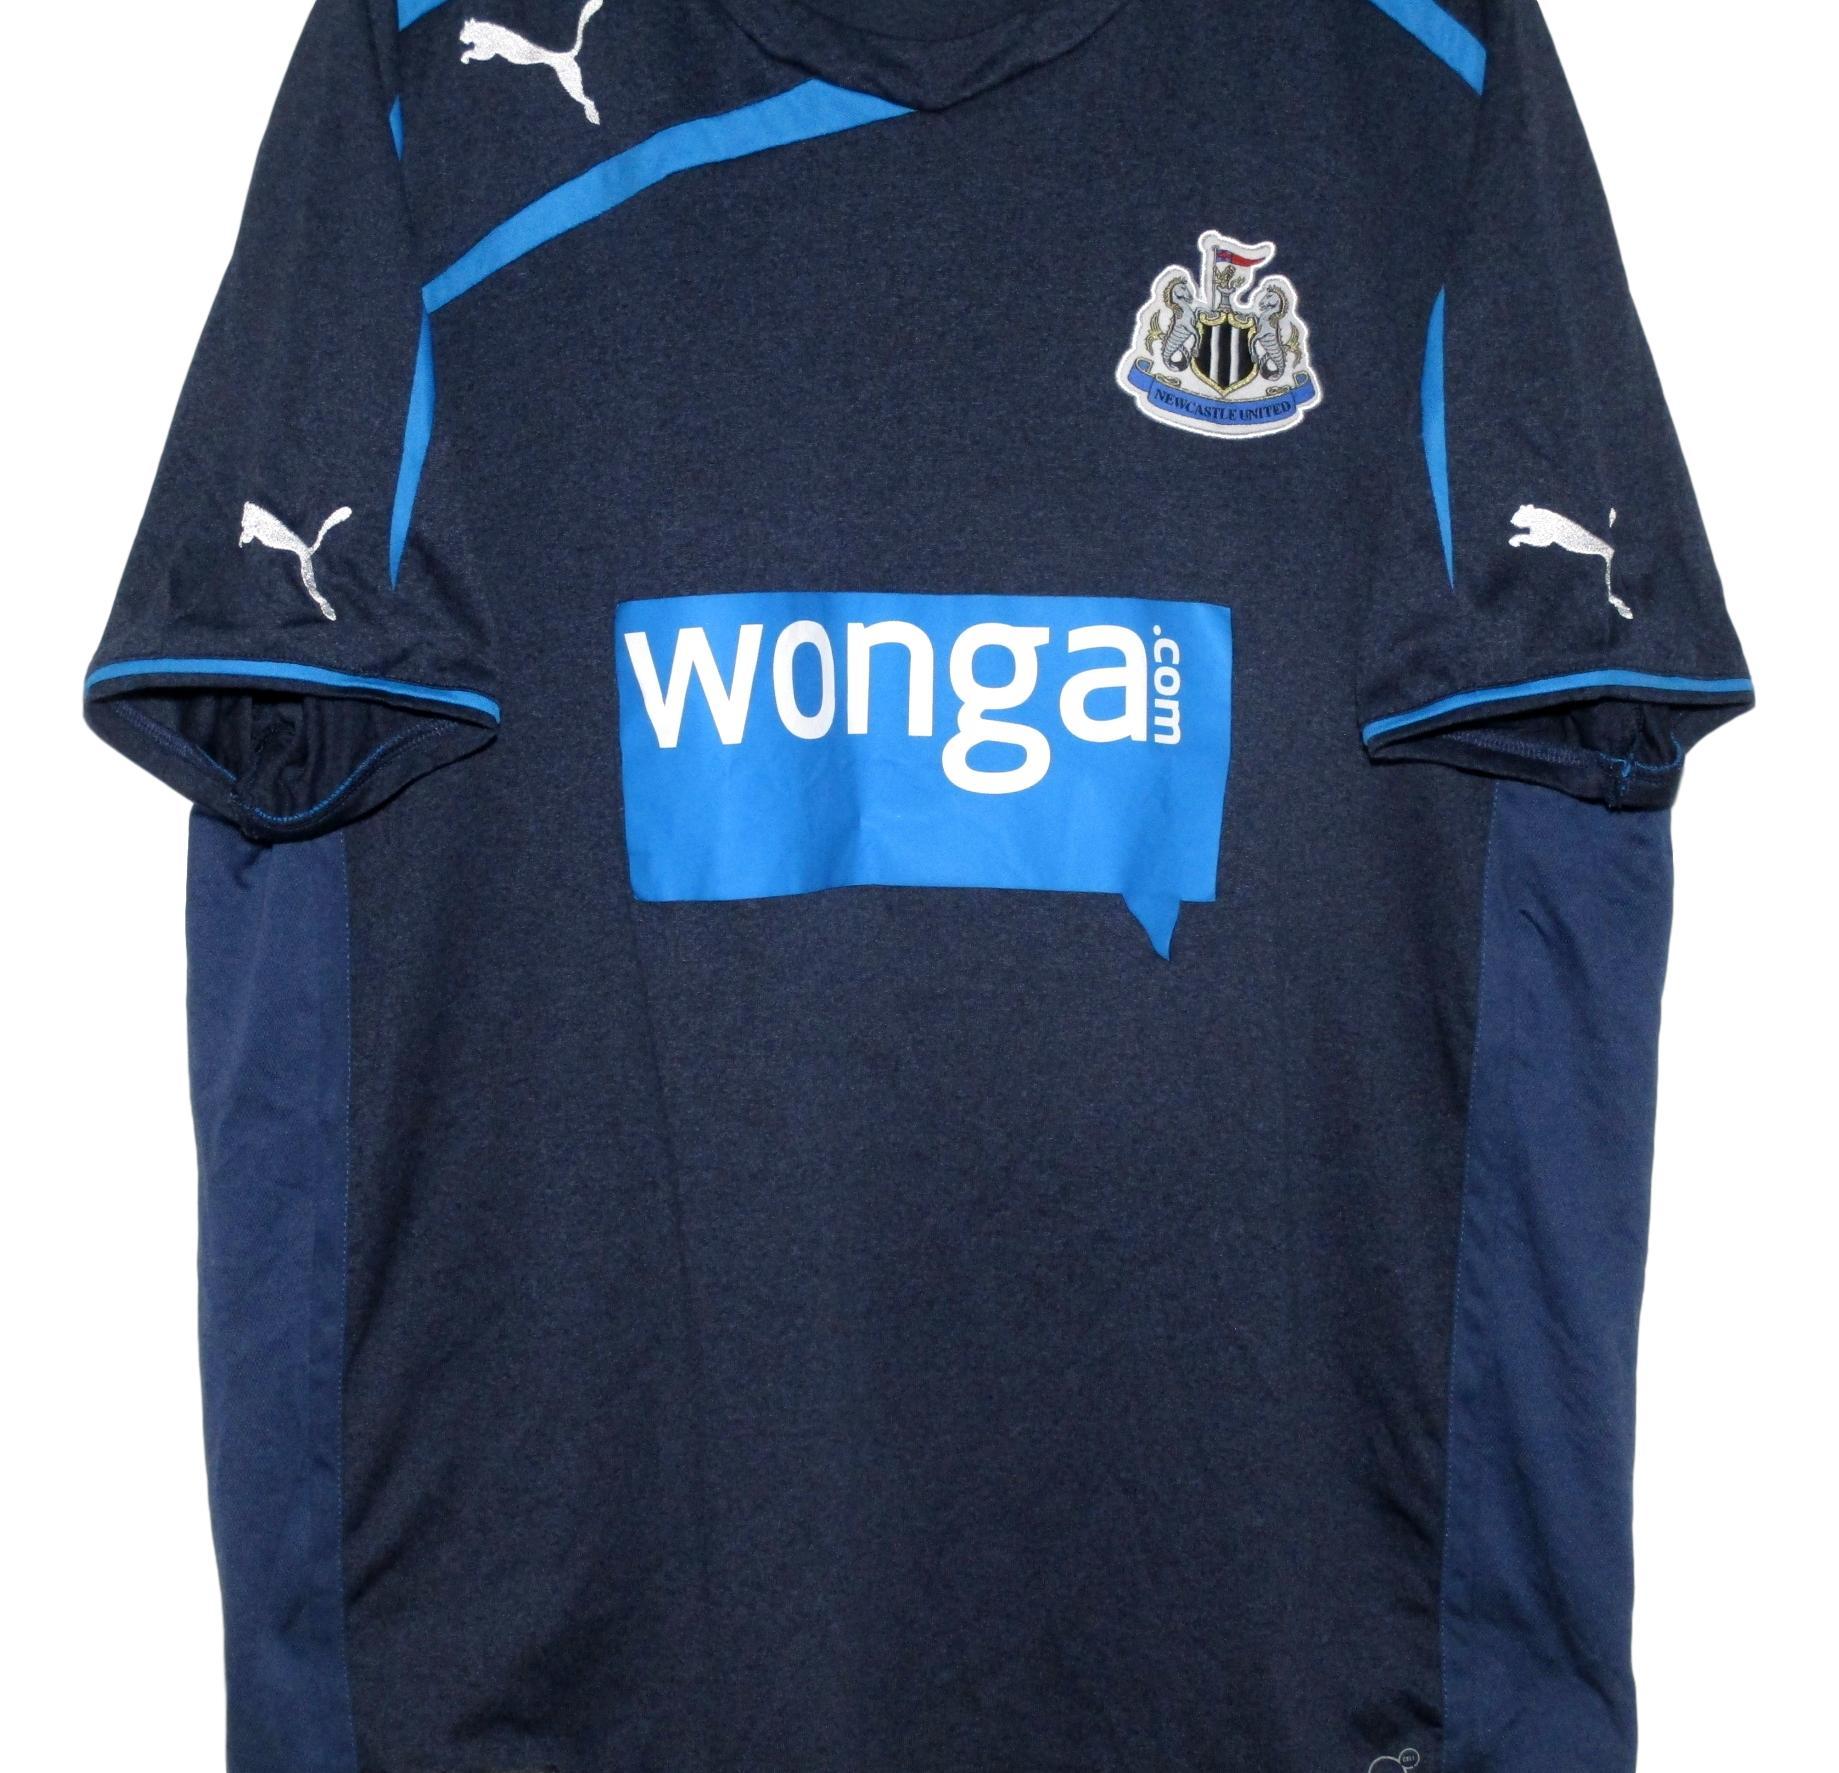 brand new ffa5b f247e 2013-14 Newcastle United Away Shirt (XL)   The Kitman Football Shirts